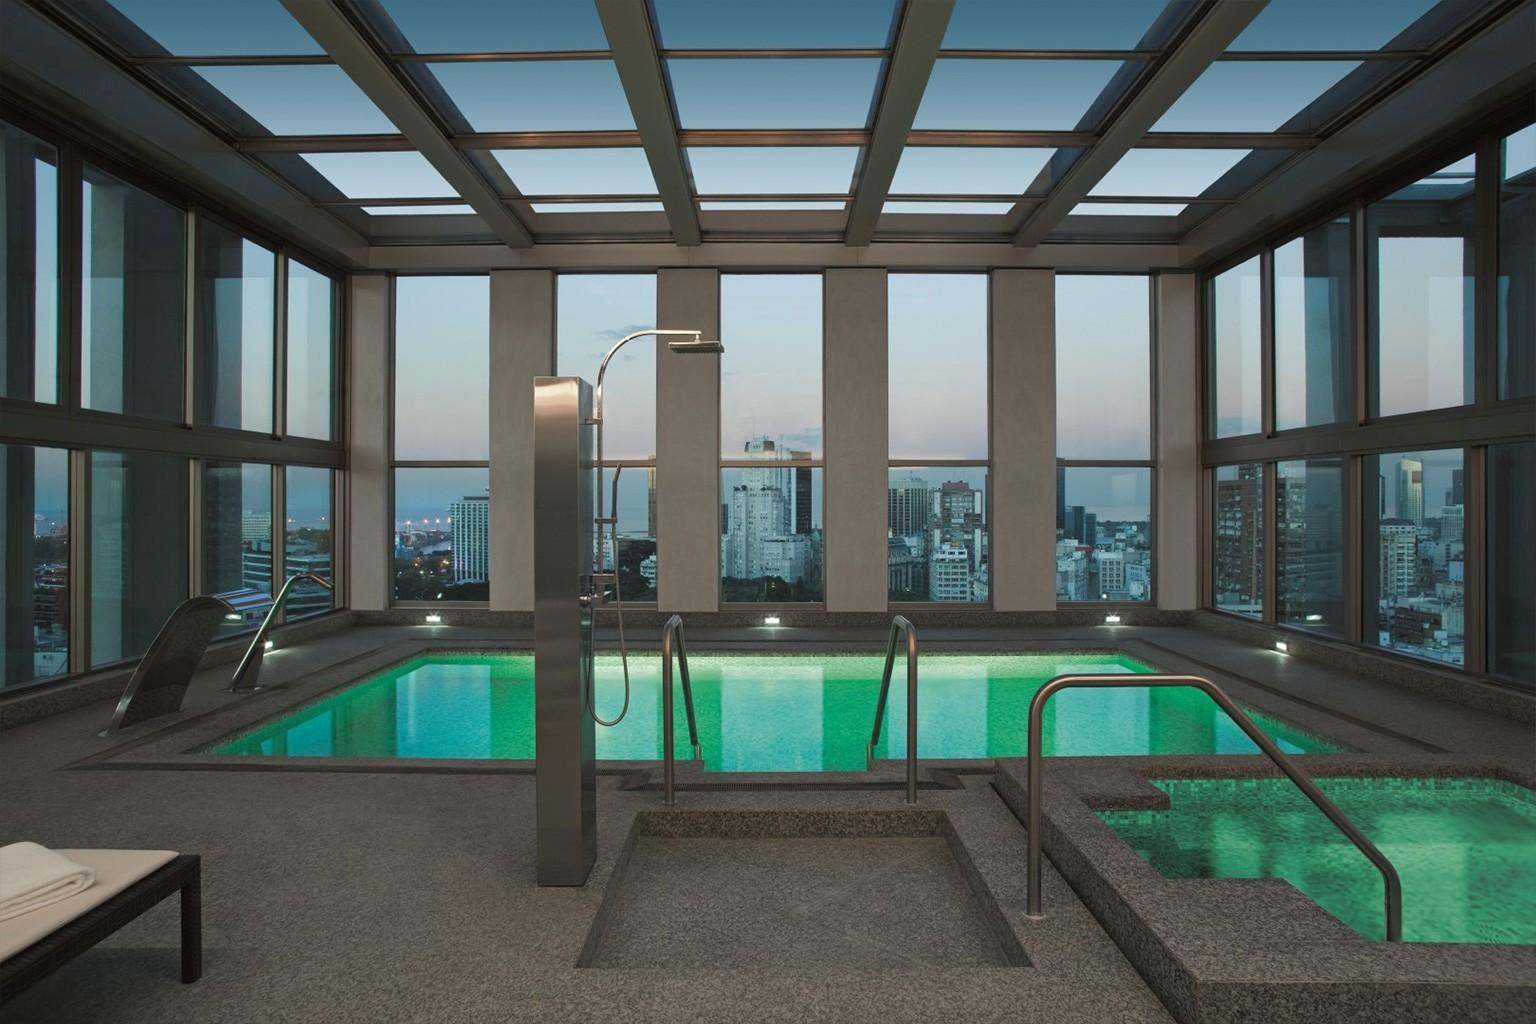 Alvear art hotel luxushotel bei designreisen for Hotel design buenos aires marcelo t de alvear